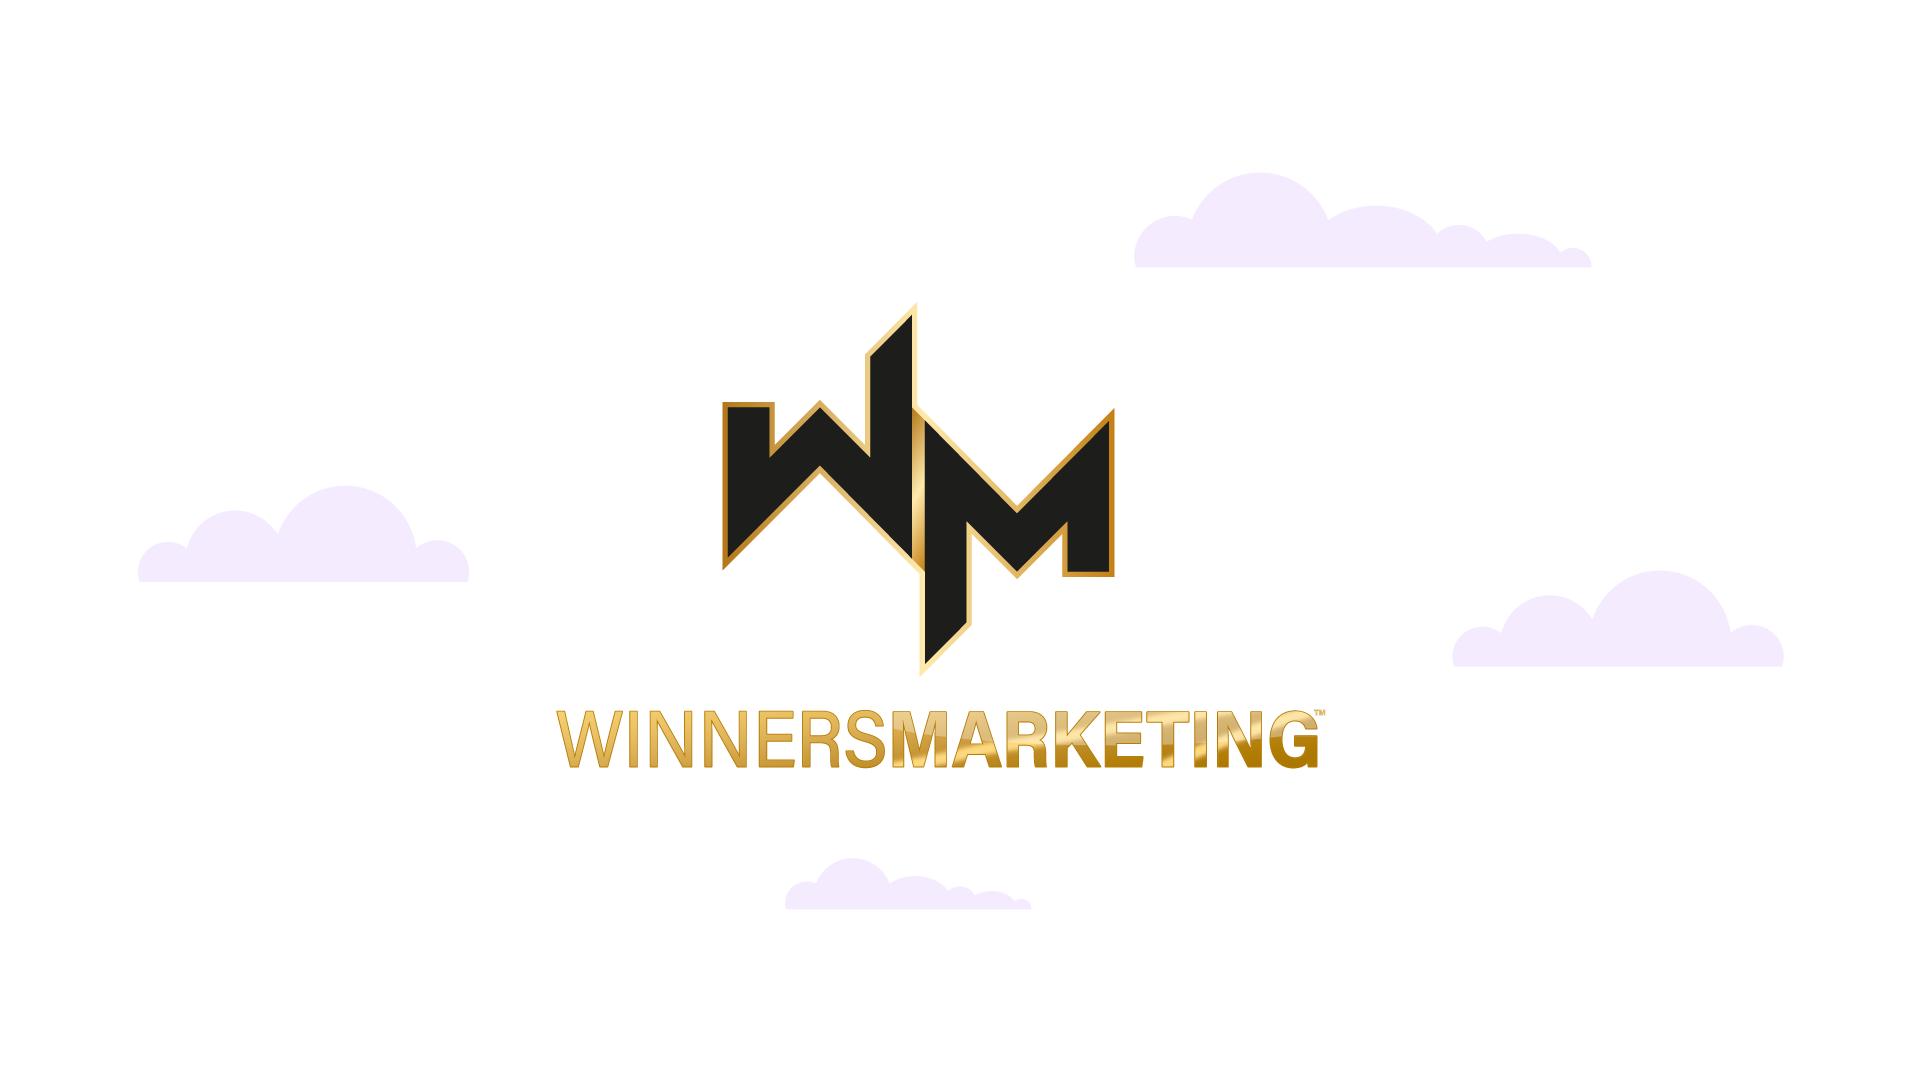 winners marketing